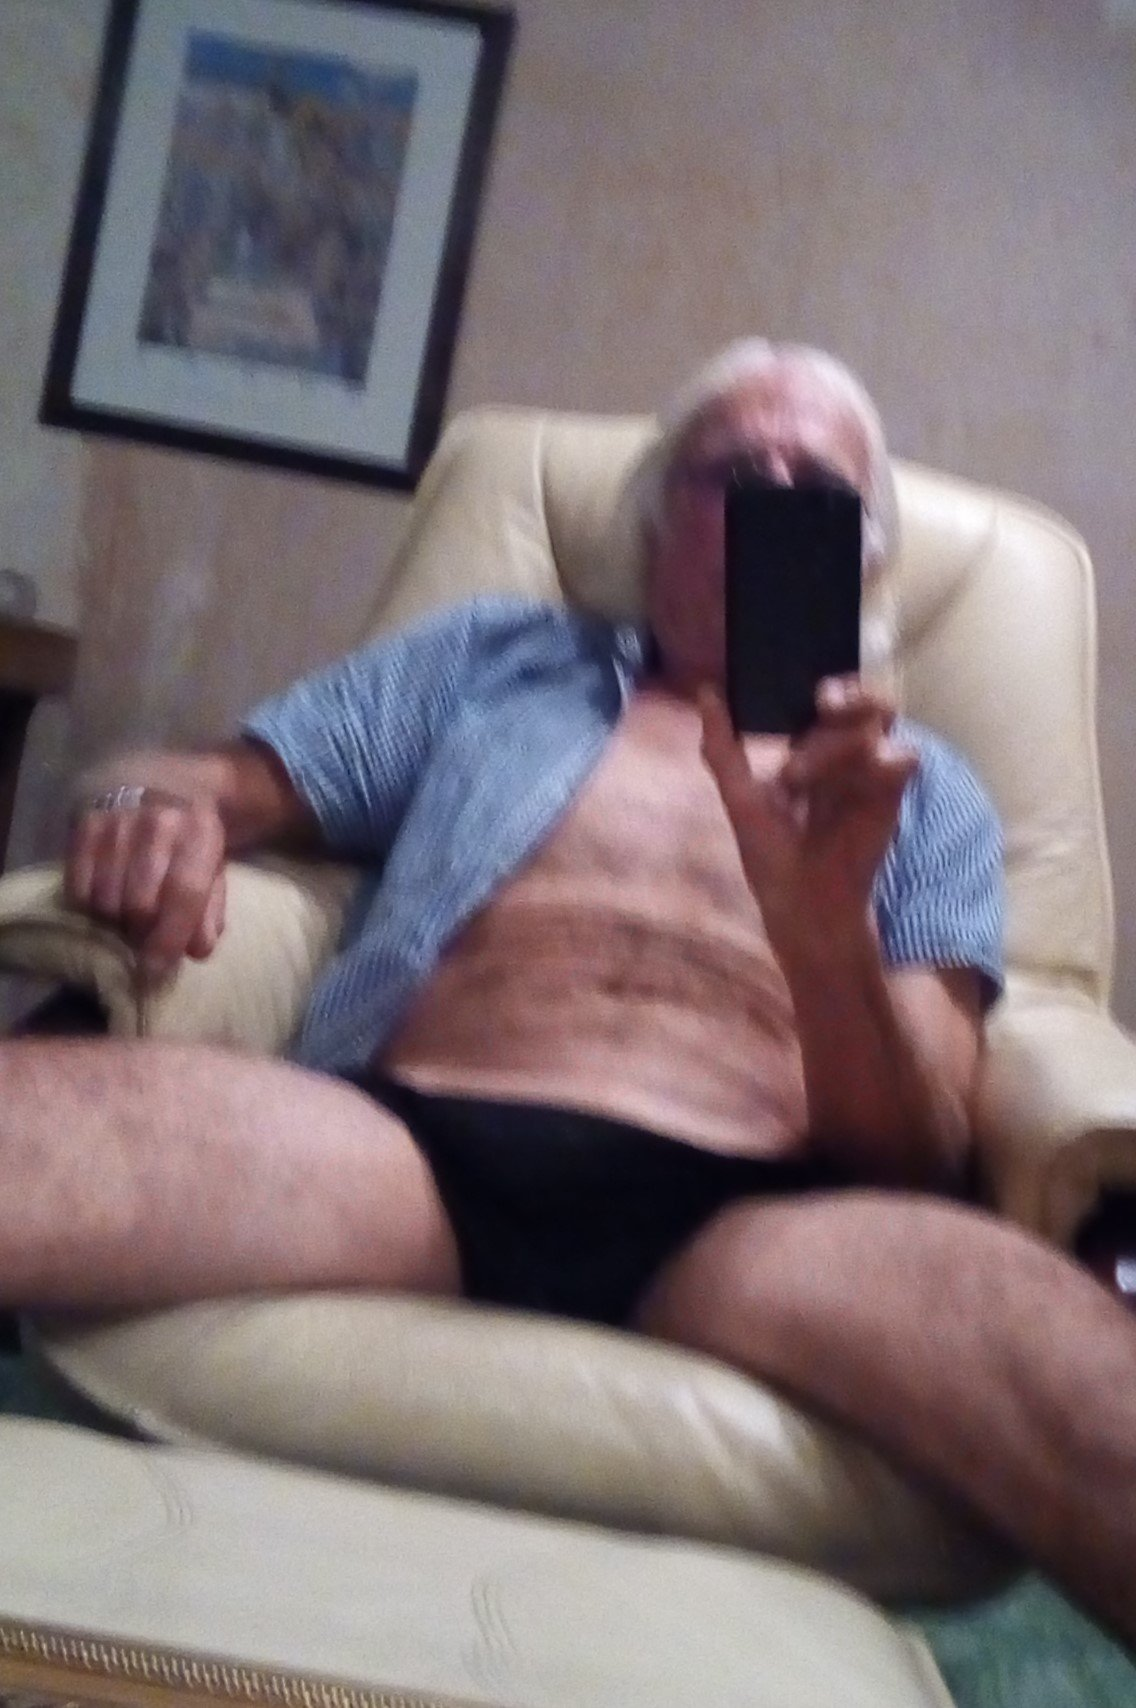 ian241922 from Hampshire,United Kingdom